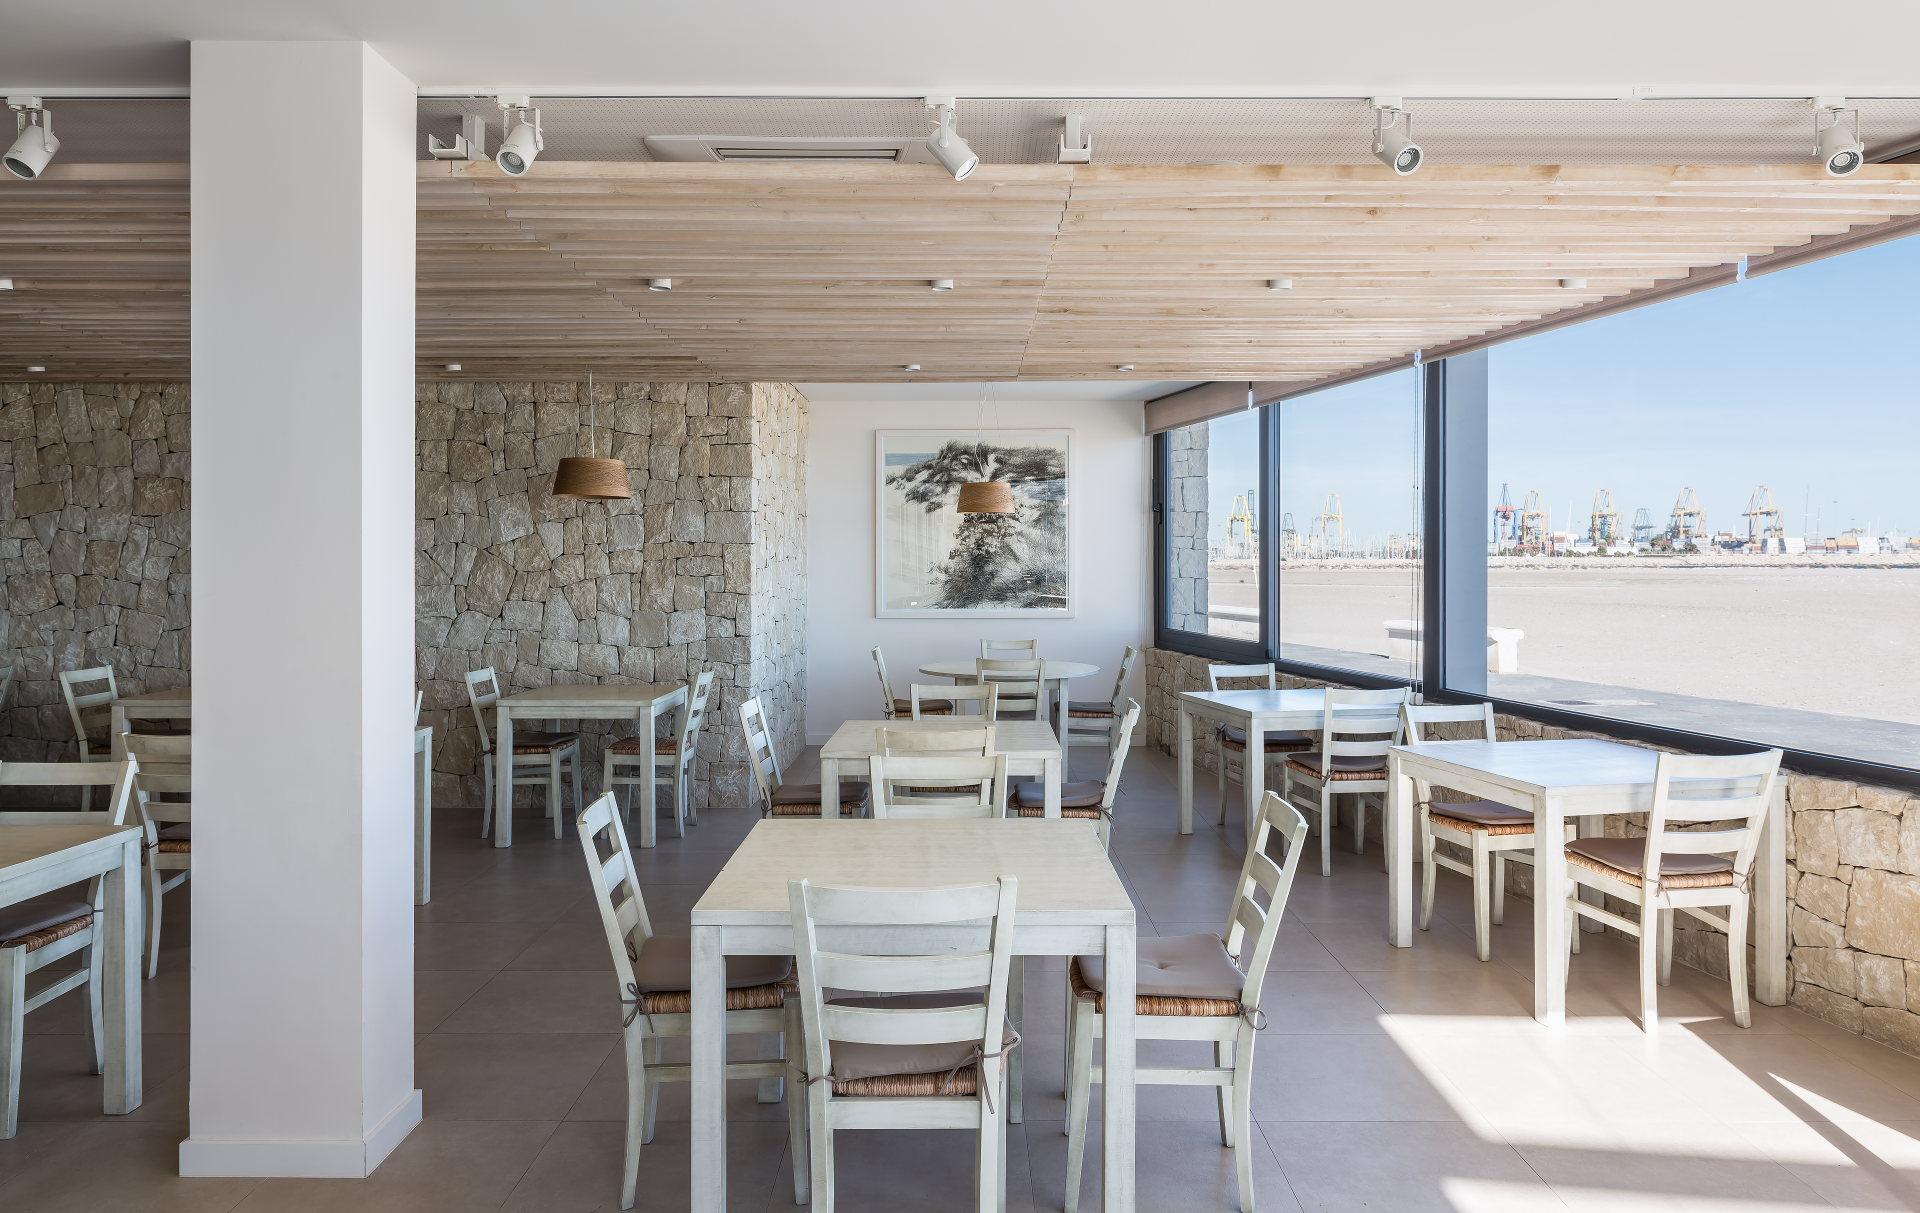 fotografia-arquitectura-valencia-german-cabo-versea-restaurante-ferrera-pinedo (15)